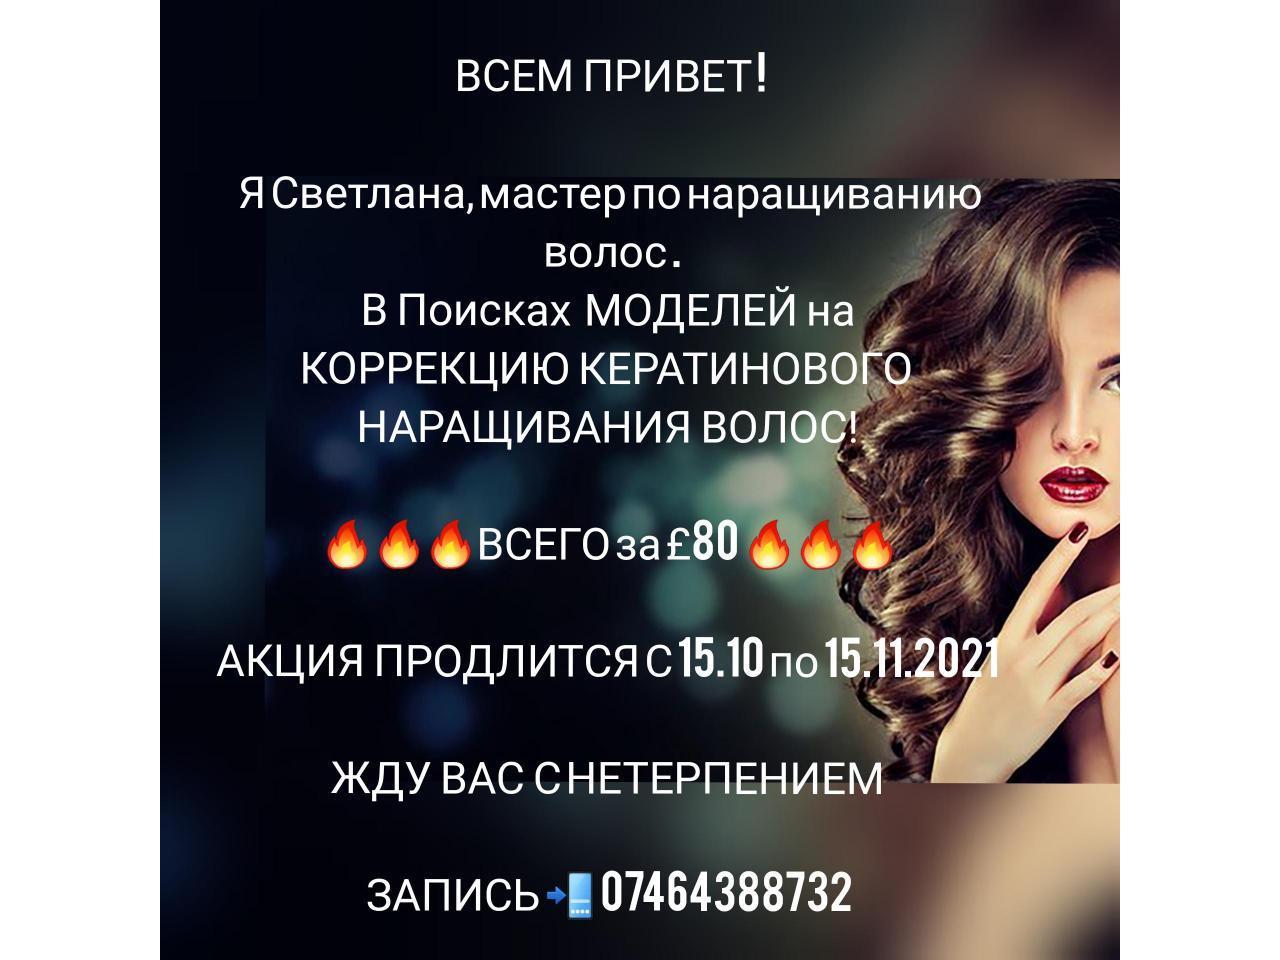 НАРАЩИВАНИЕ ВОЛОС - 1